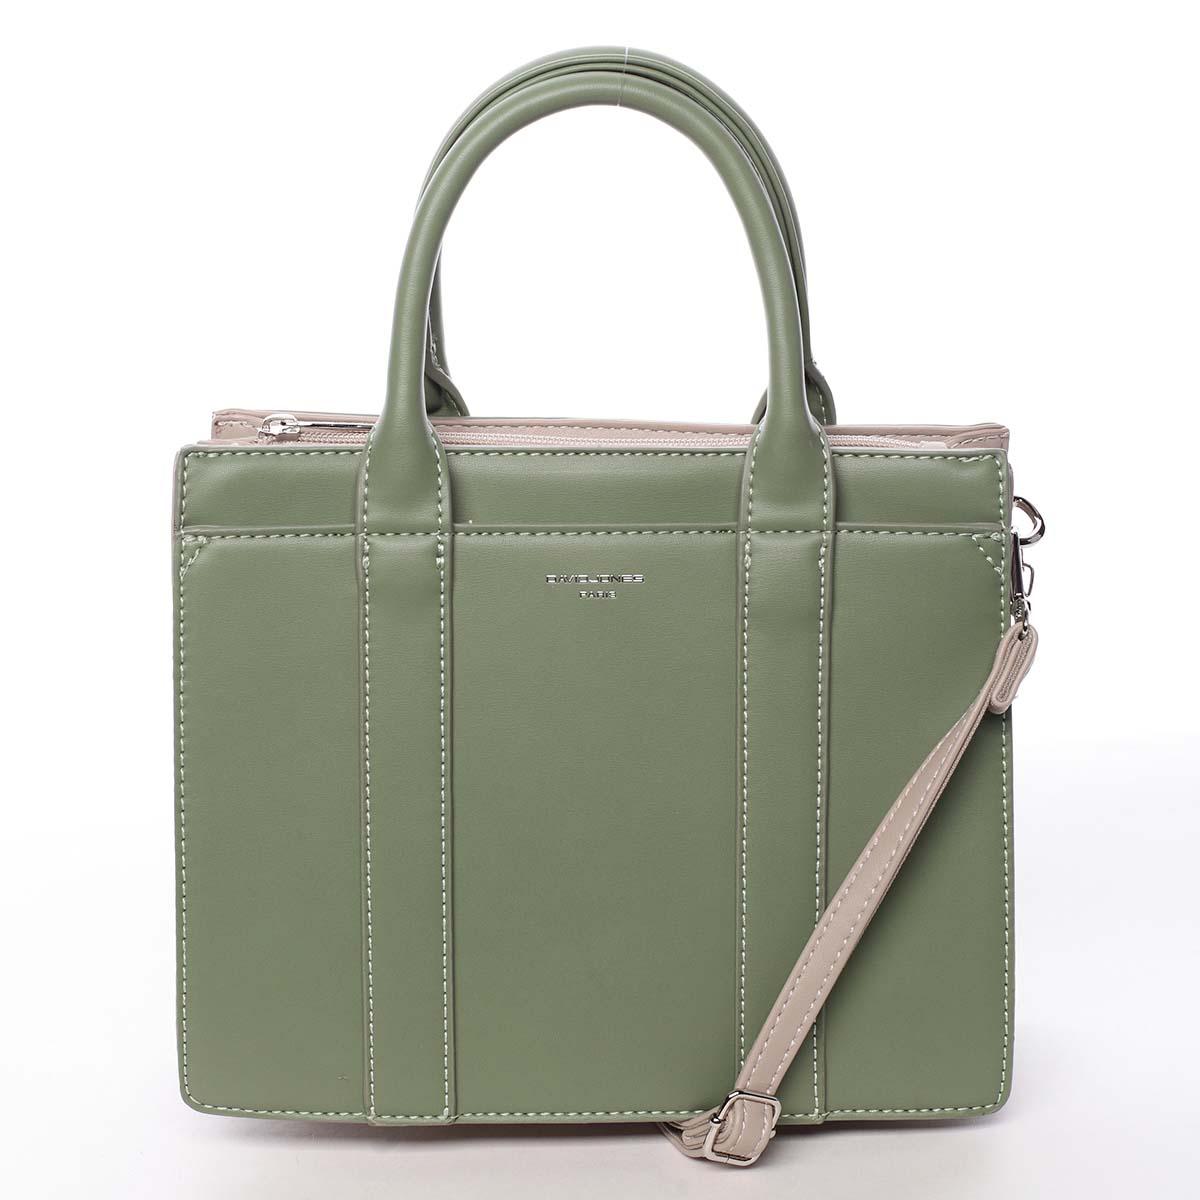 Malá dámská kabelka do ruky zelená - David Jones Akiba